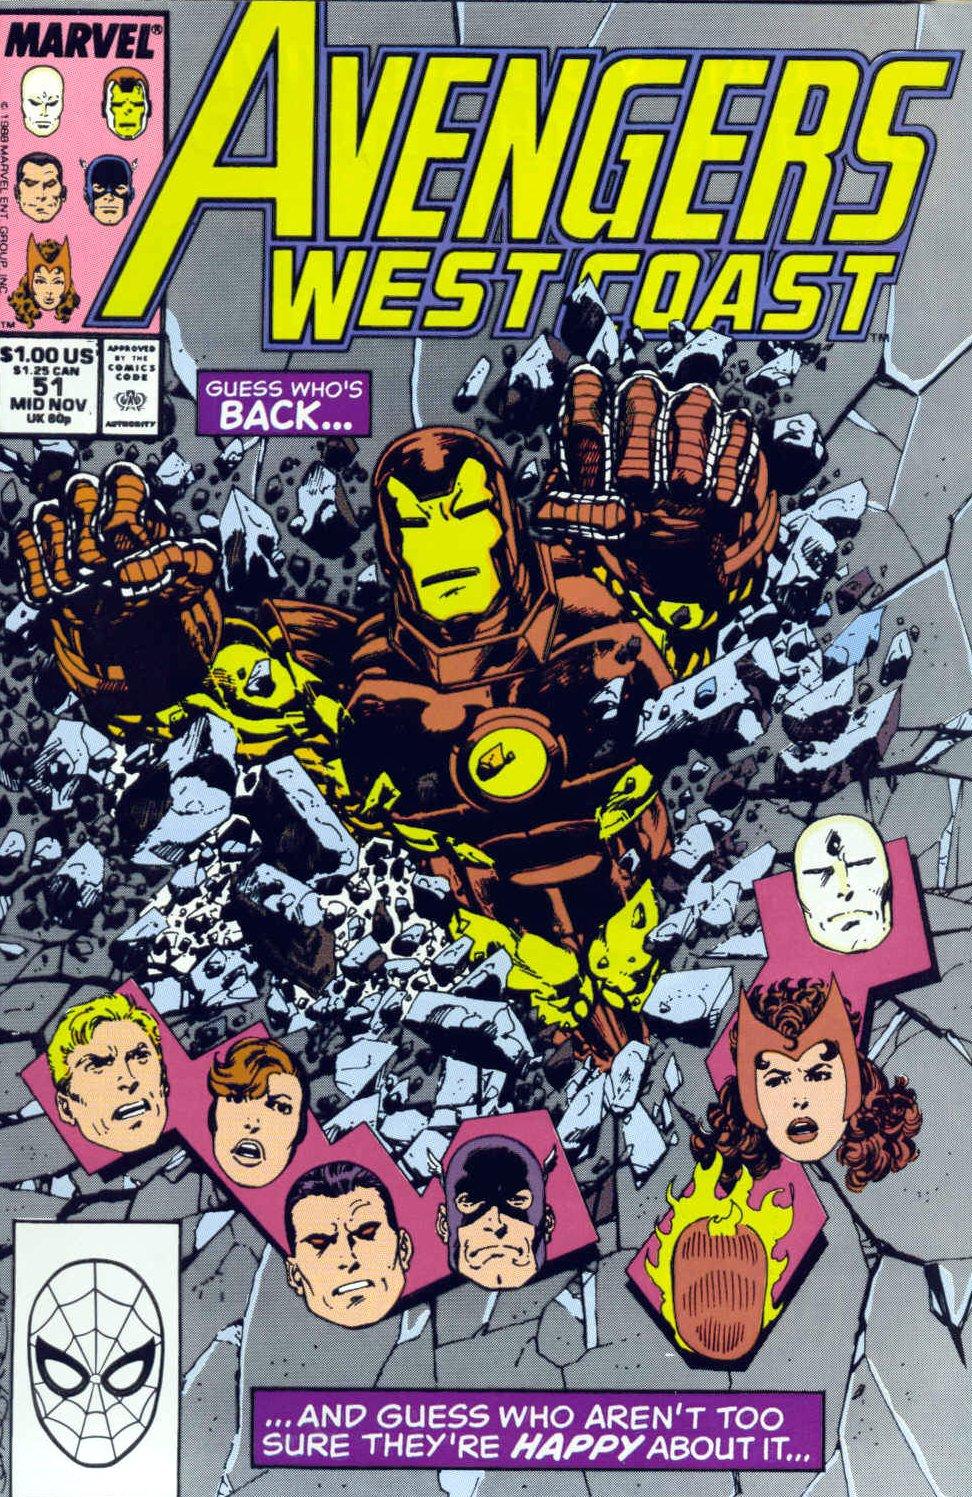 Avengers West Coast (1989) 51 Page 1